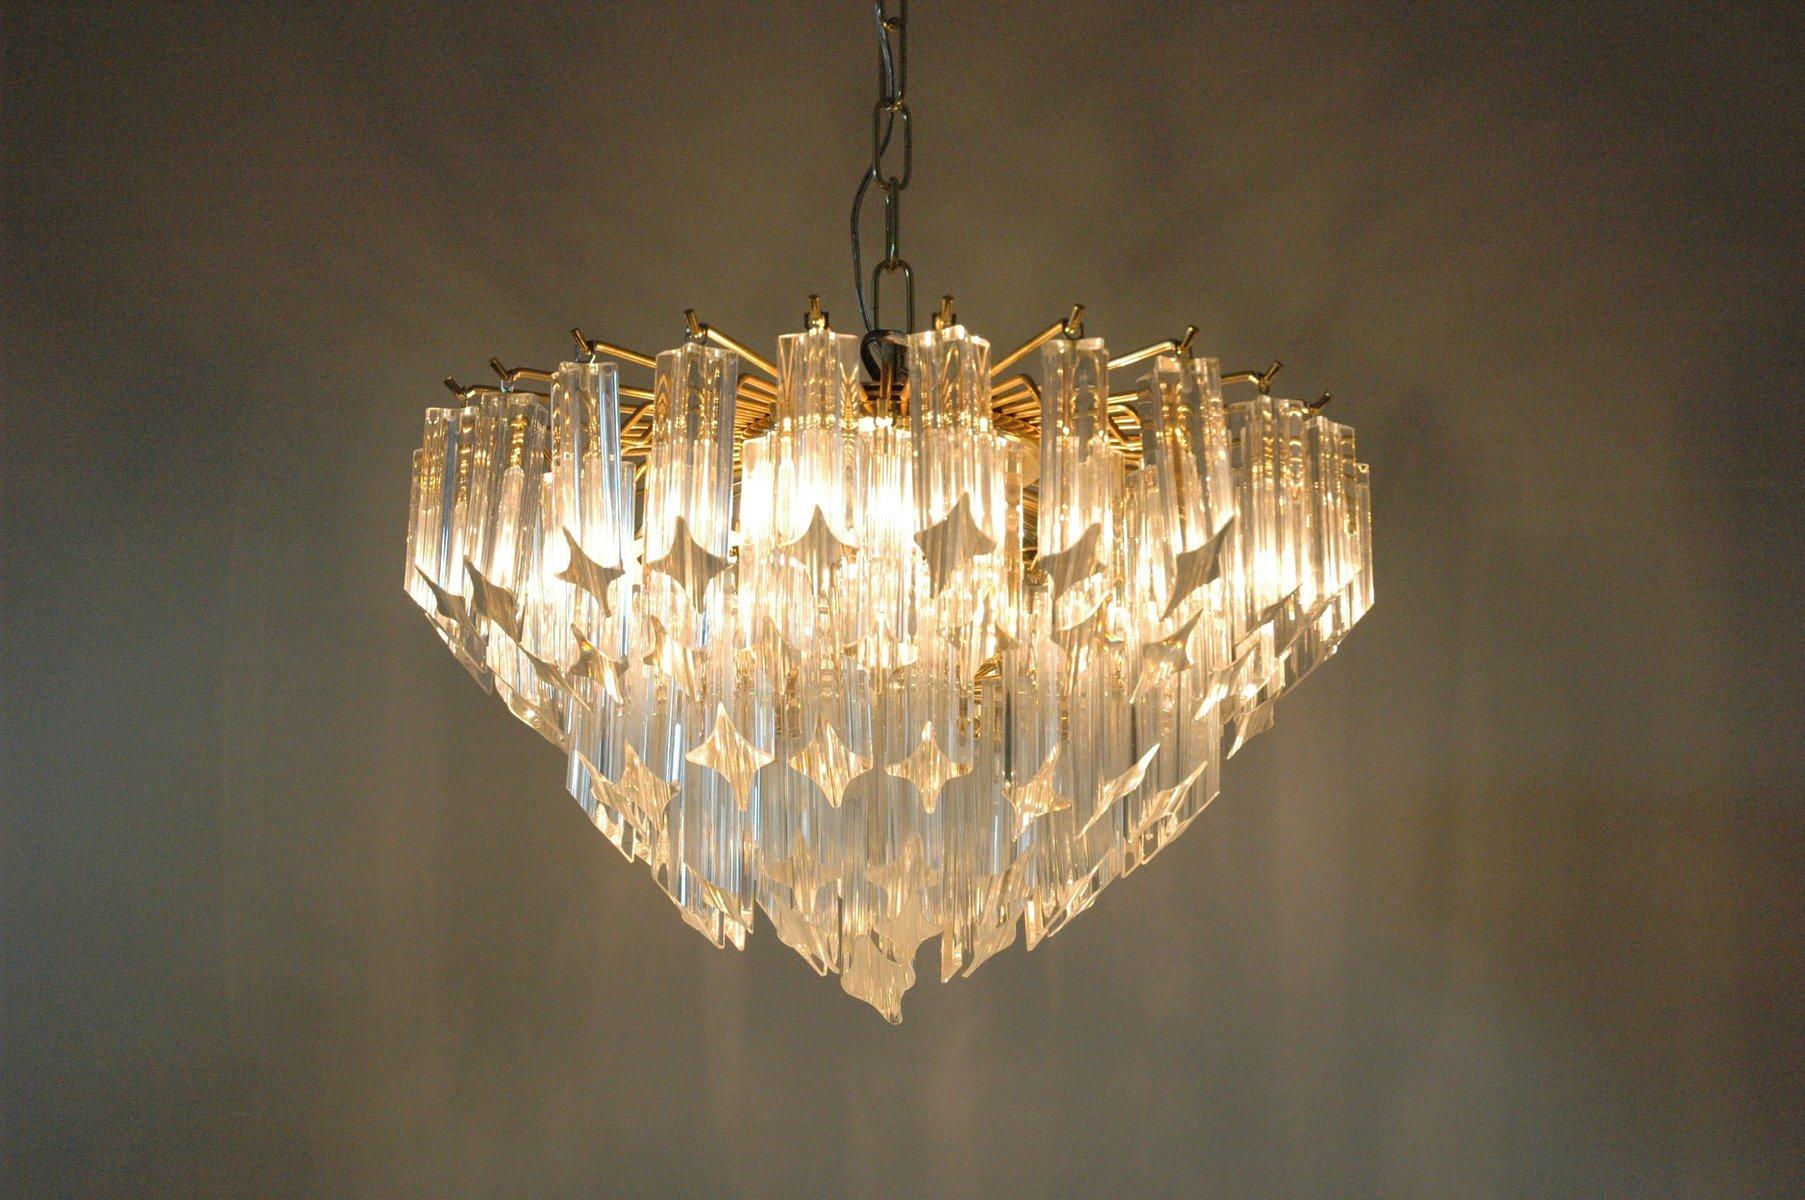 Lampadario sospensione obi obi lampioni da giardino elegante